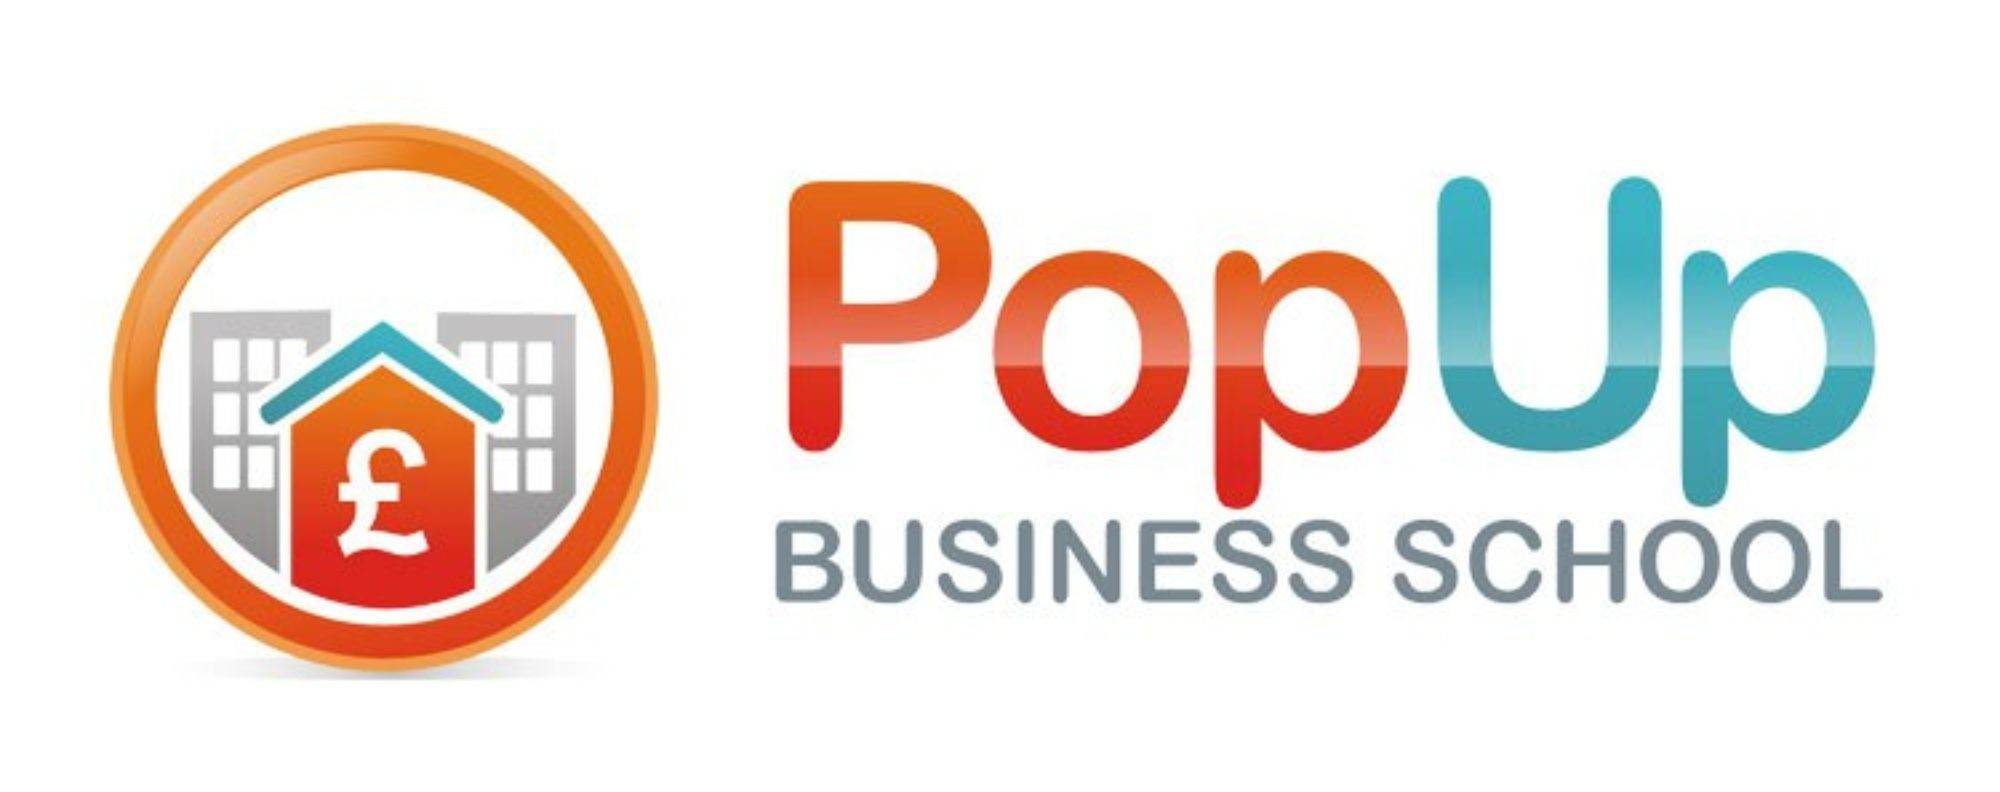 Derwent London supports Westminster Pop-up Business School